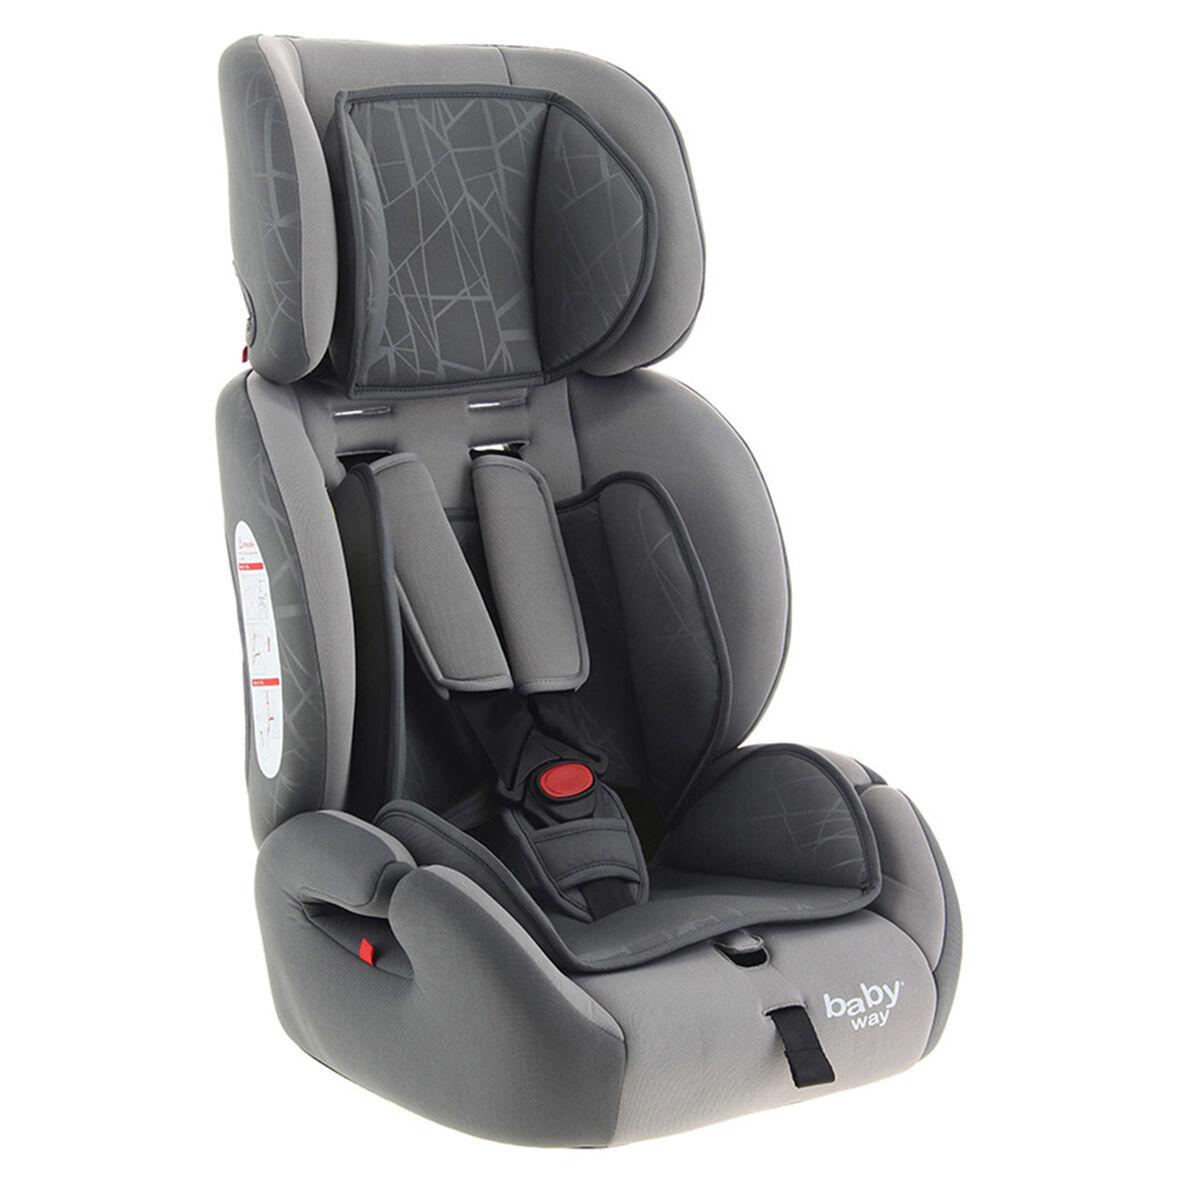 Silla para Auto Baby Way BW 749G19